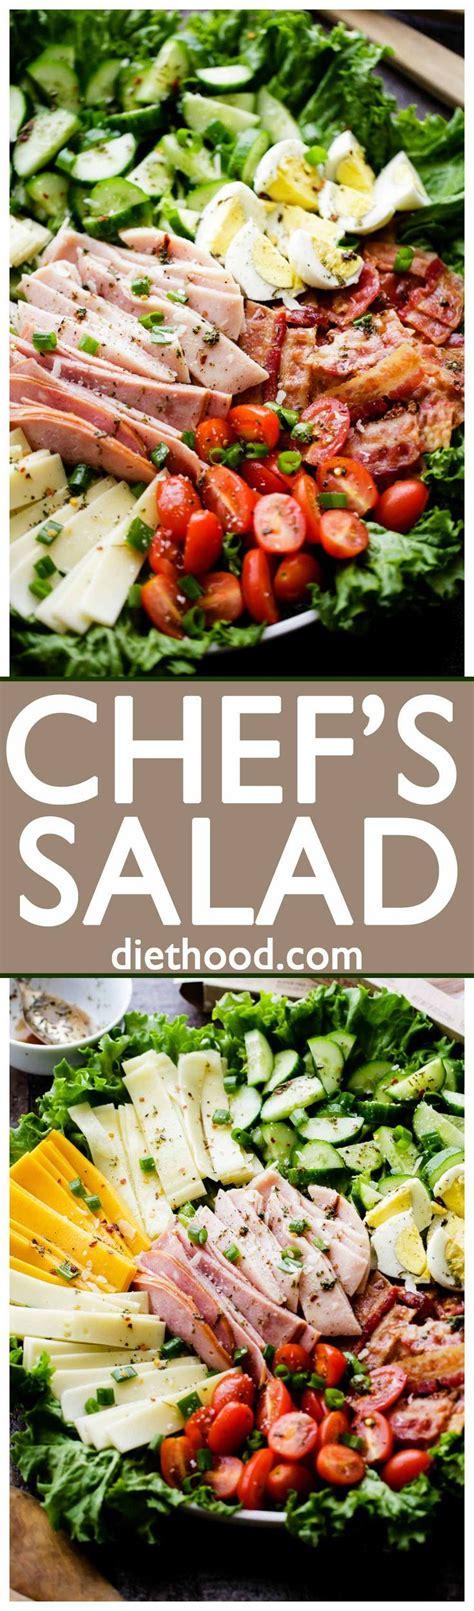 dinner salad recipes 25 best ideas about salad recipes on pinterest dinner salads salad ideas and healthy salad